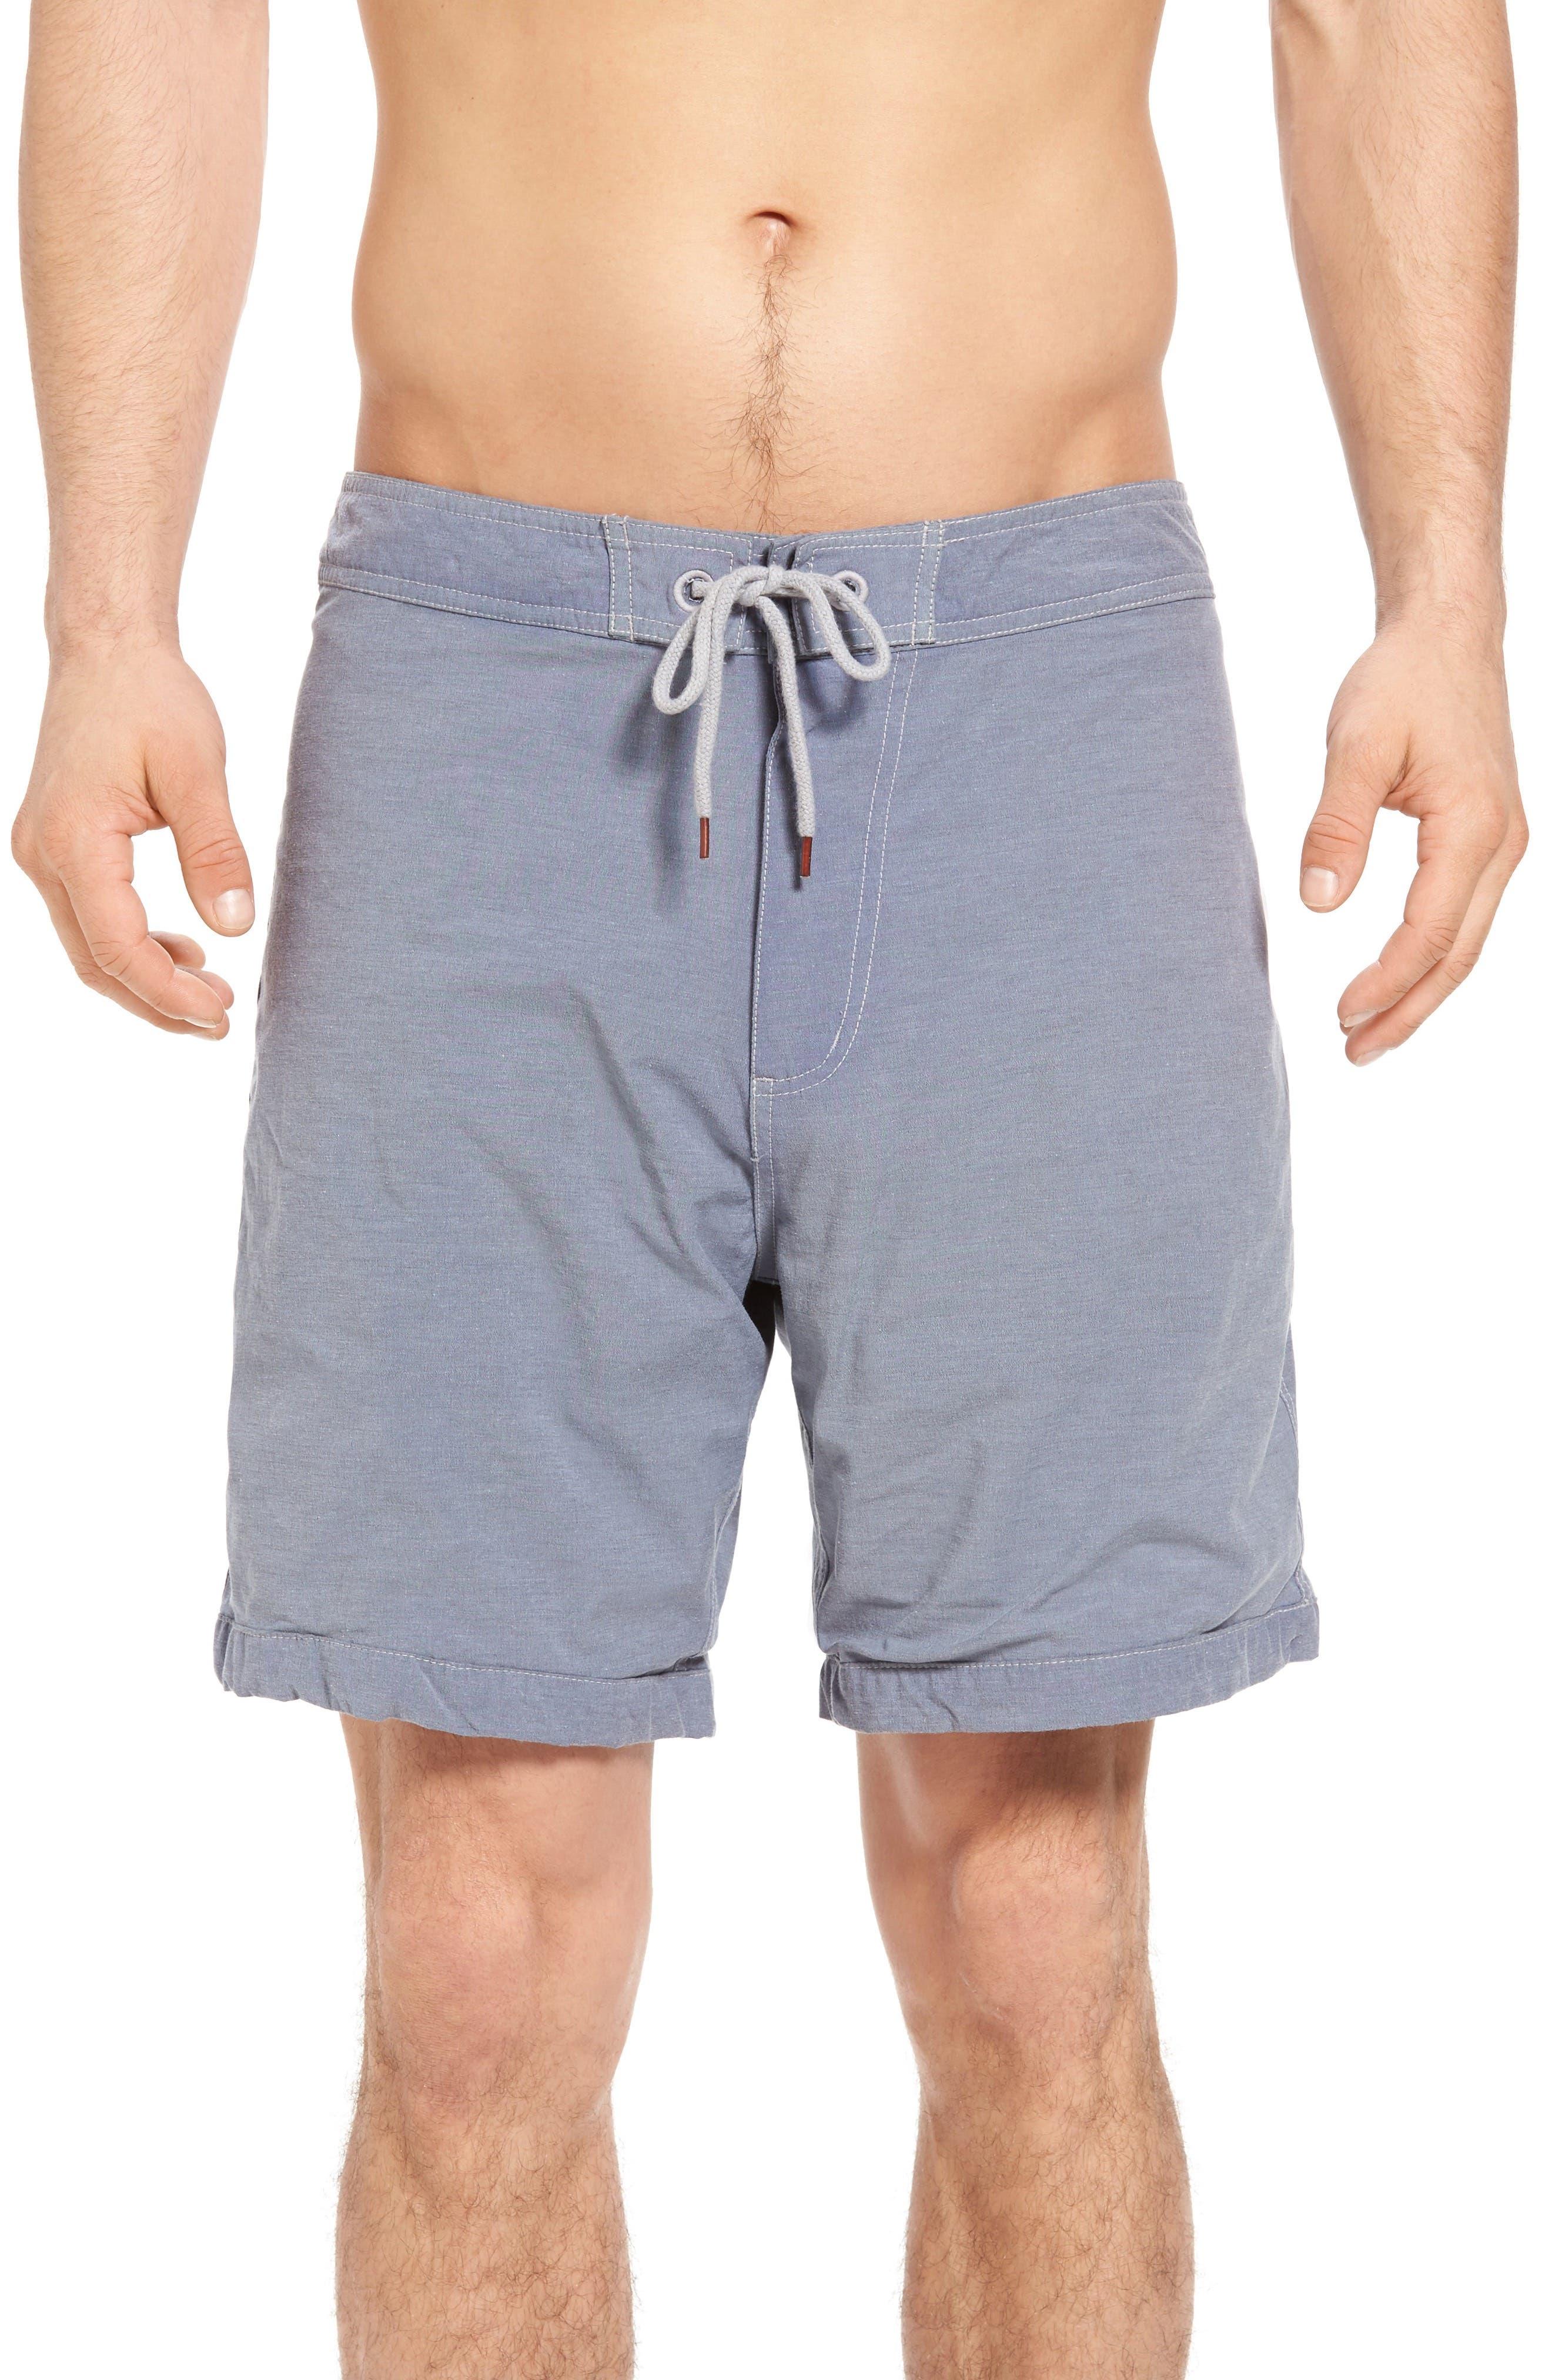 Venice Board Shorts,                             Alternate thumbnail 2, color,                             029